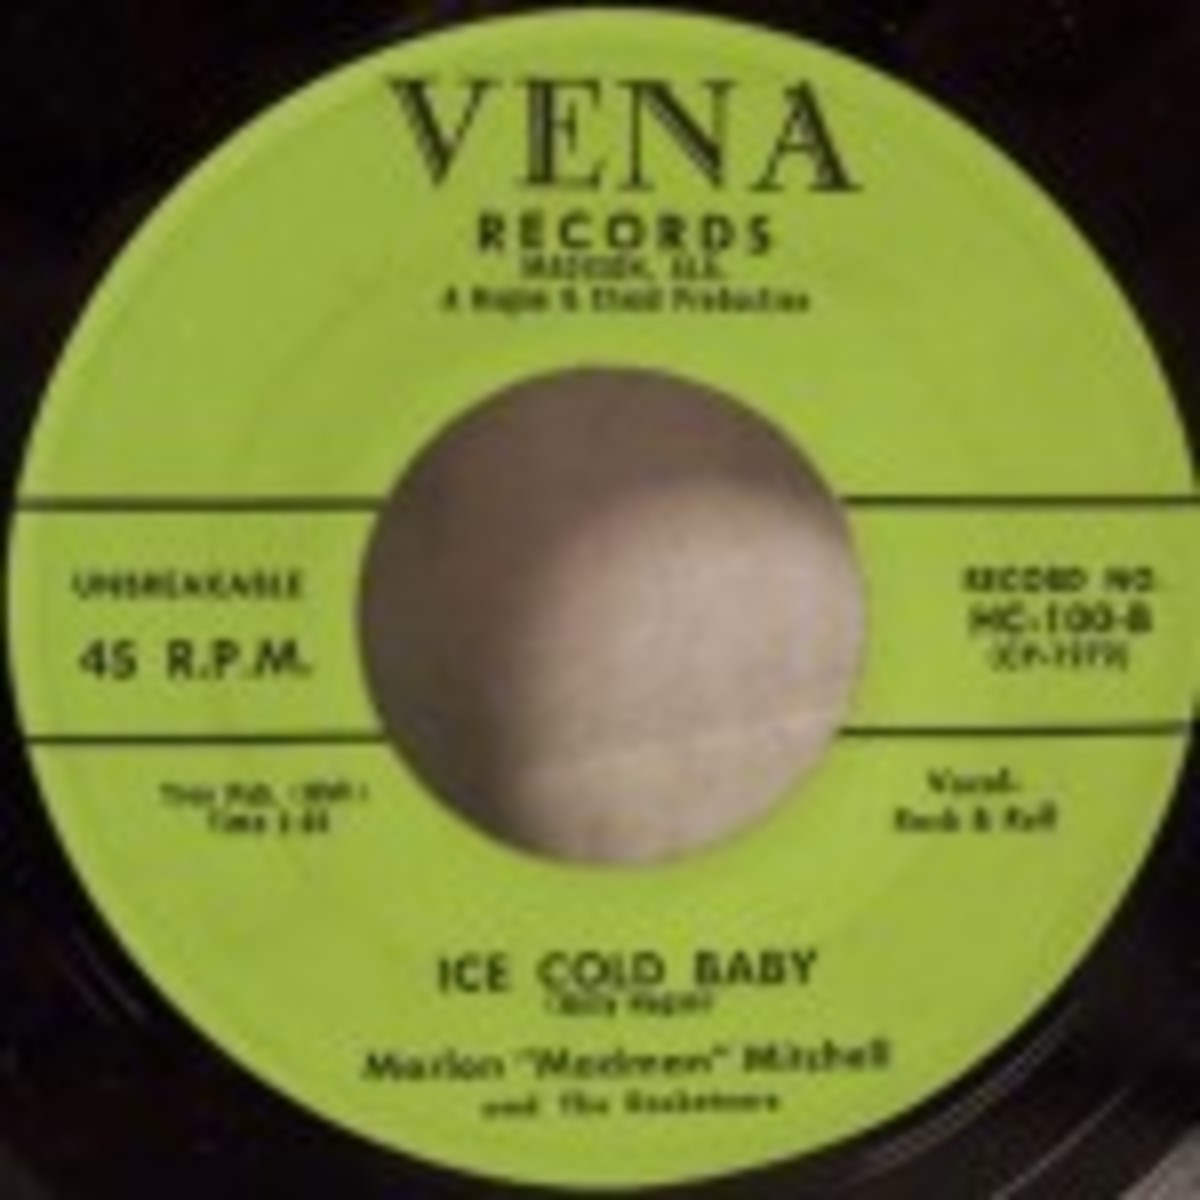 Marlon Madman Mitchell Ice Cold Baby